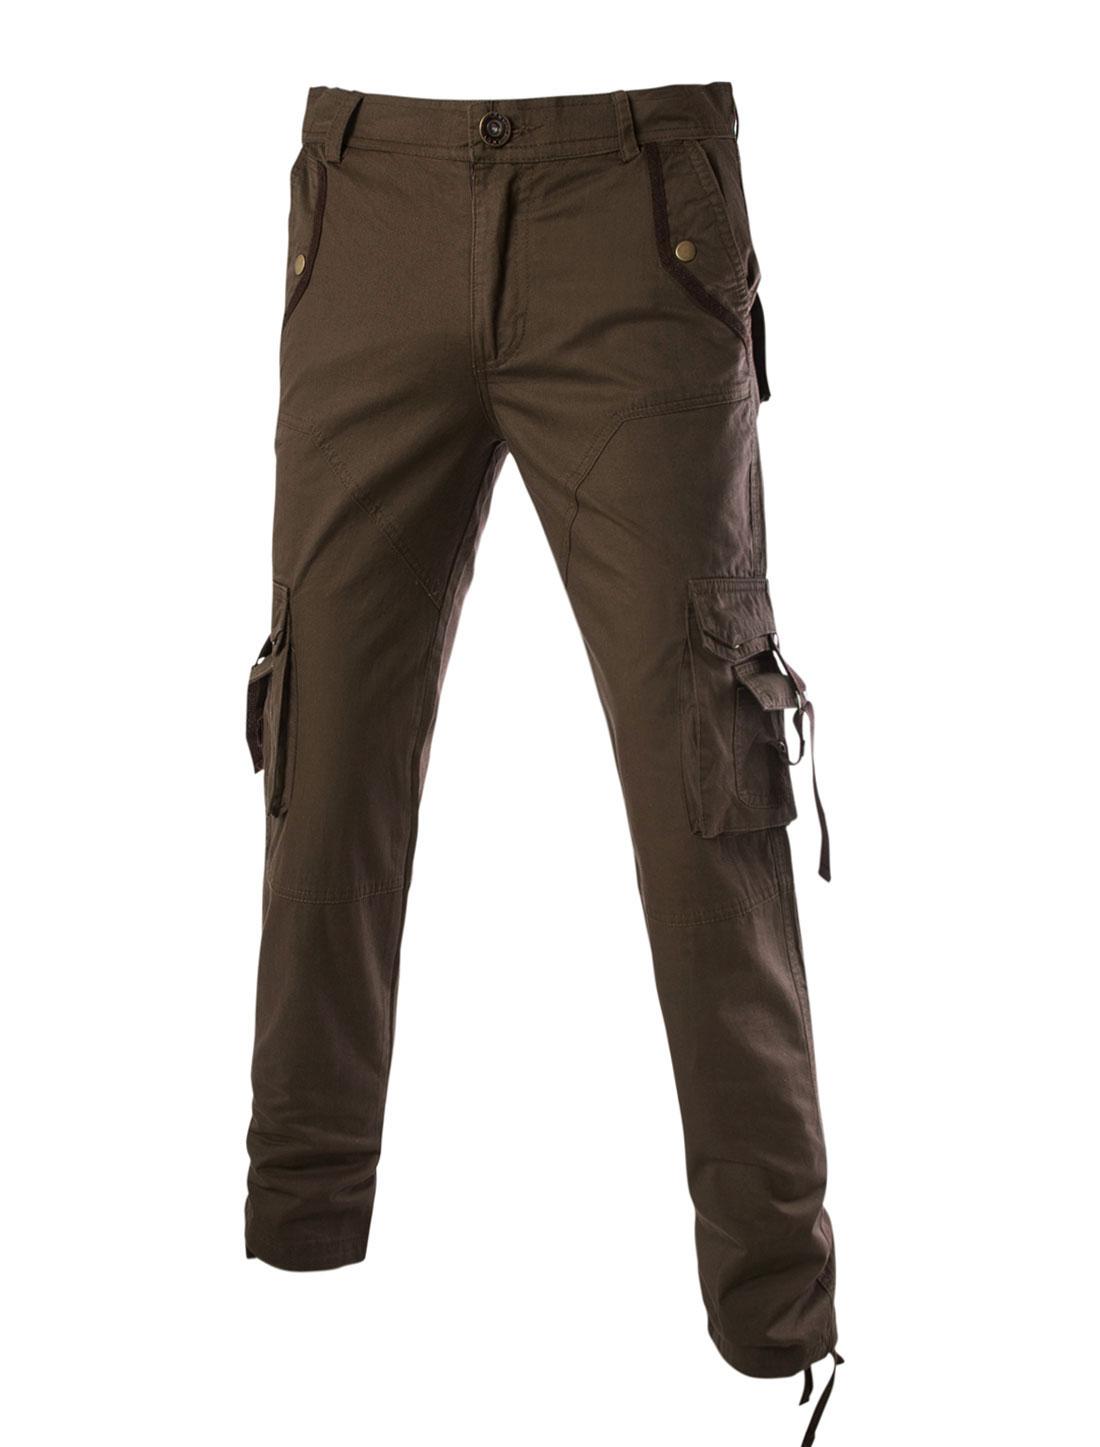 Men Mid Rise Twill Military Cotton Wide Leg Cargo Trousers Khaki W36